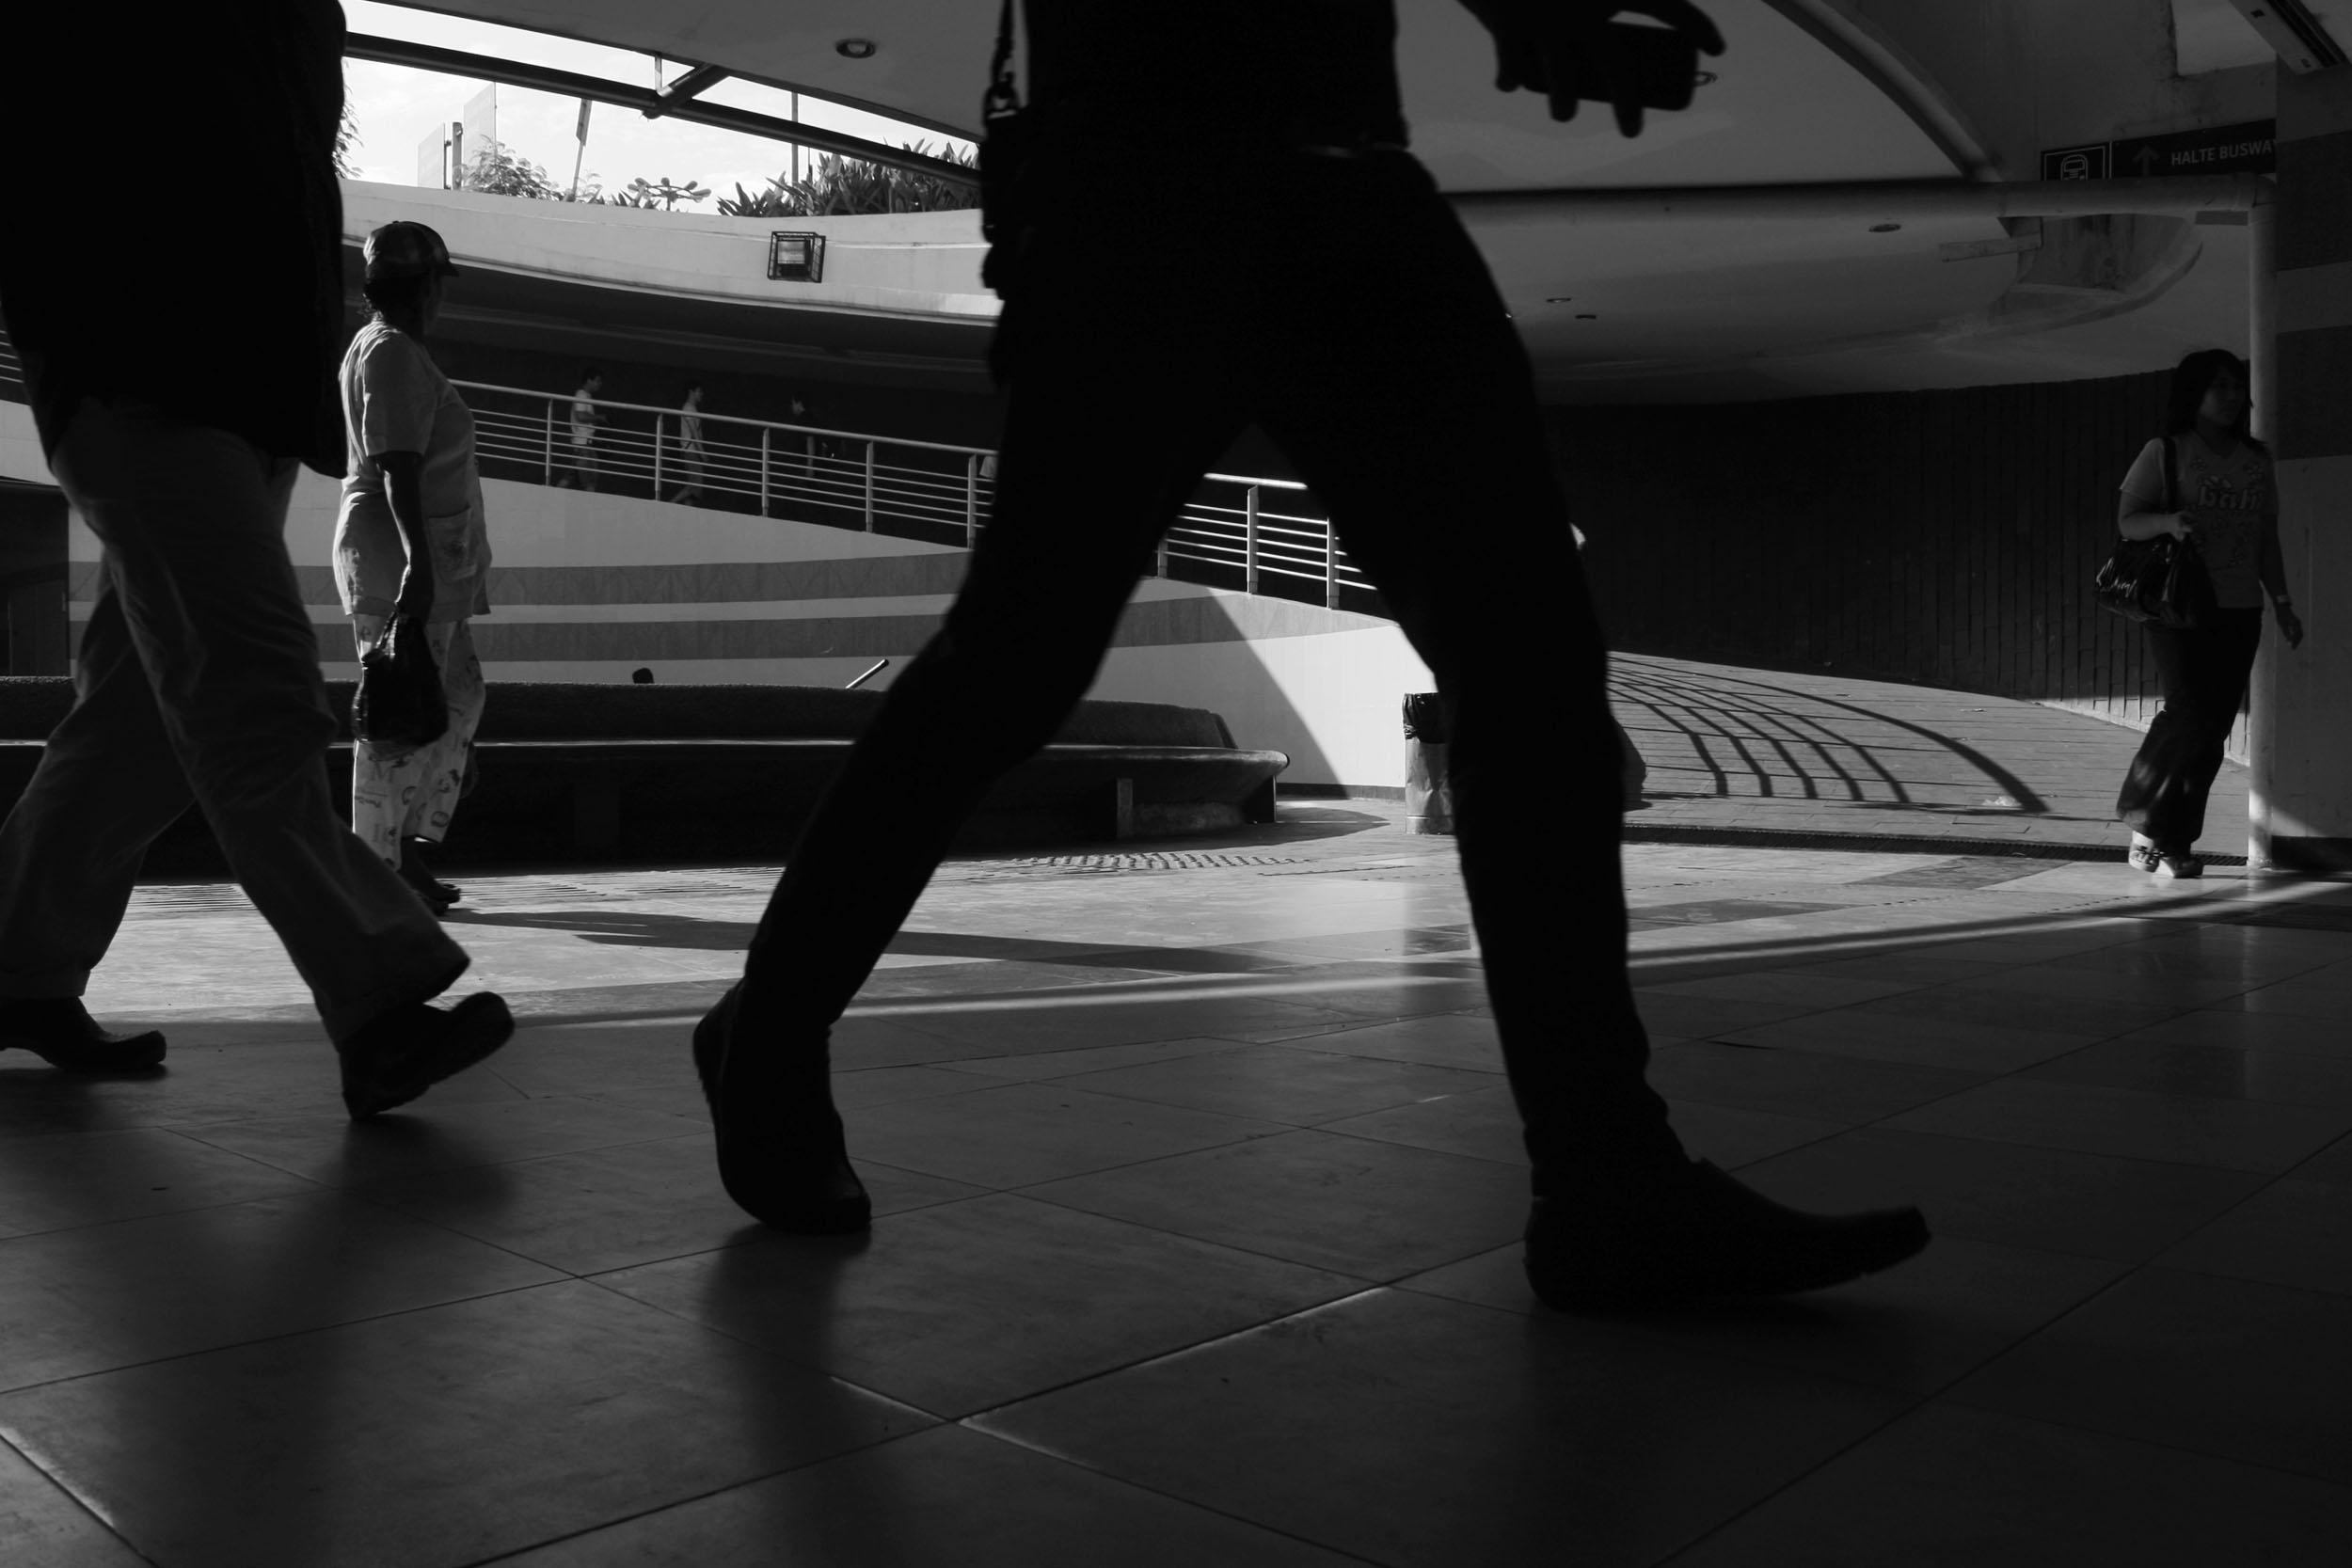 Komposisi Dan Framing Dalam Street Photography Human Interest